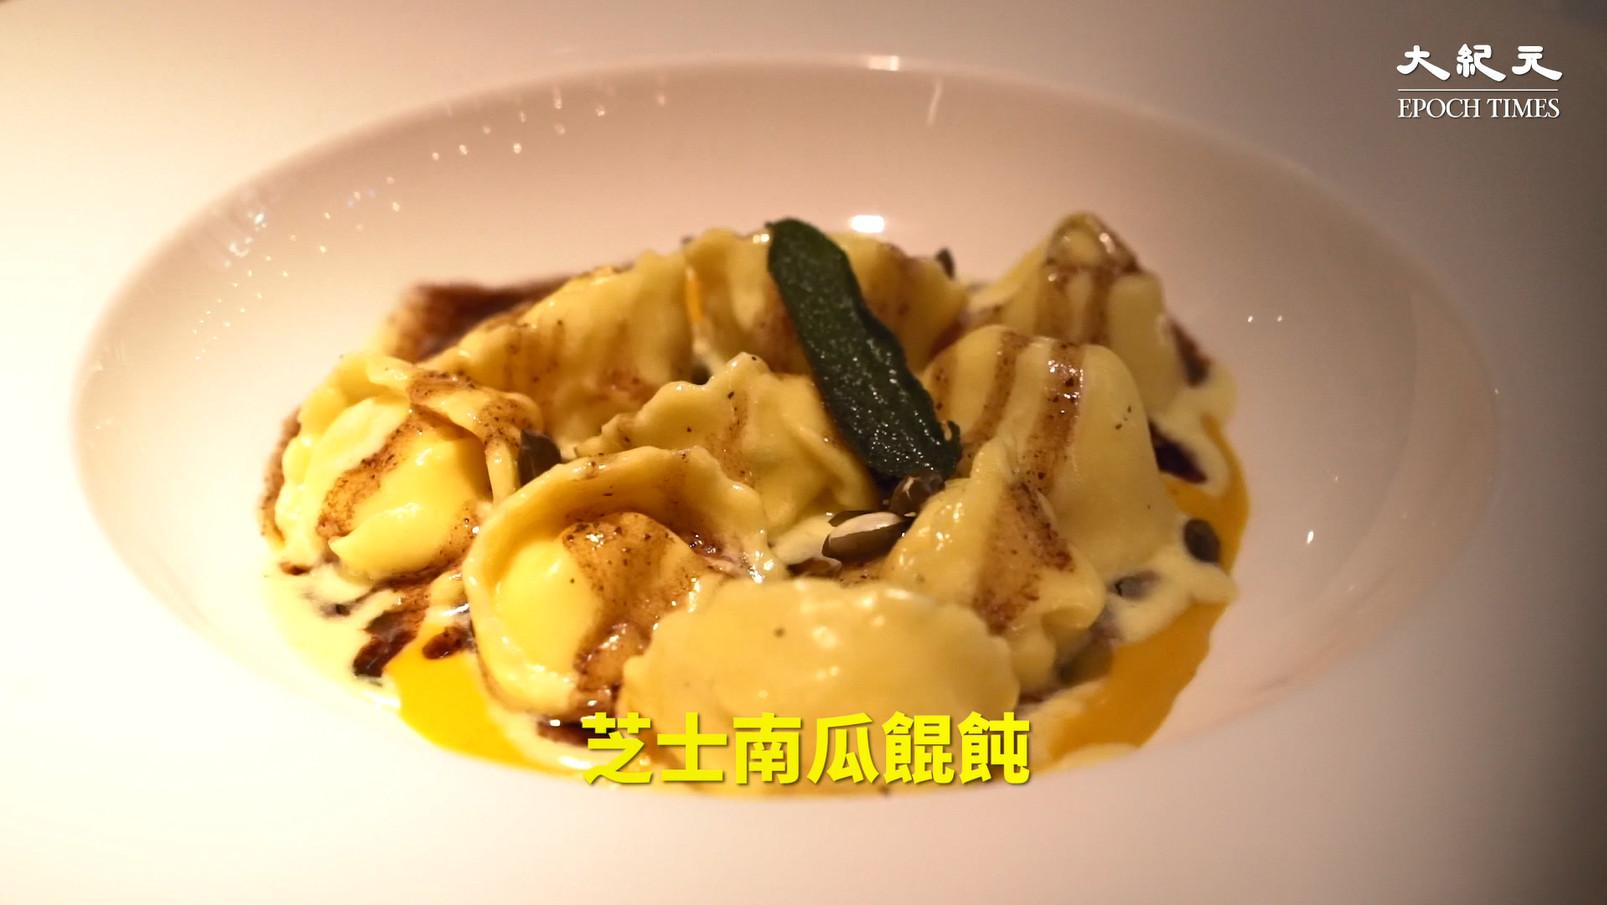 Cappelletti入口芝士味香濃而不膩,如果熱一點會更好吃。(影片擷圖)